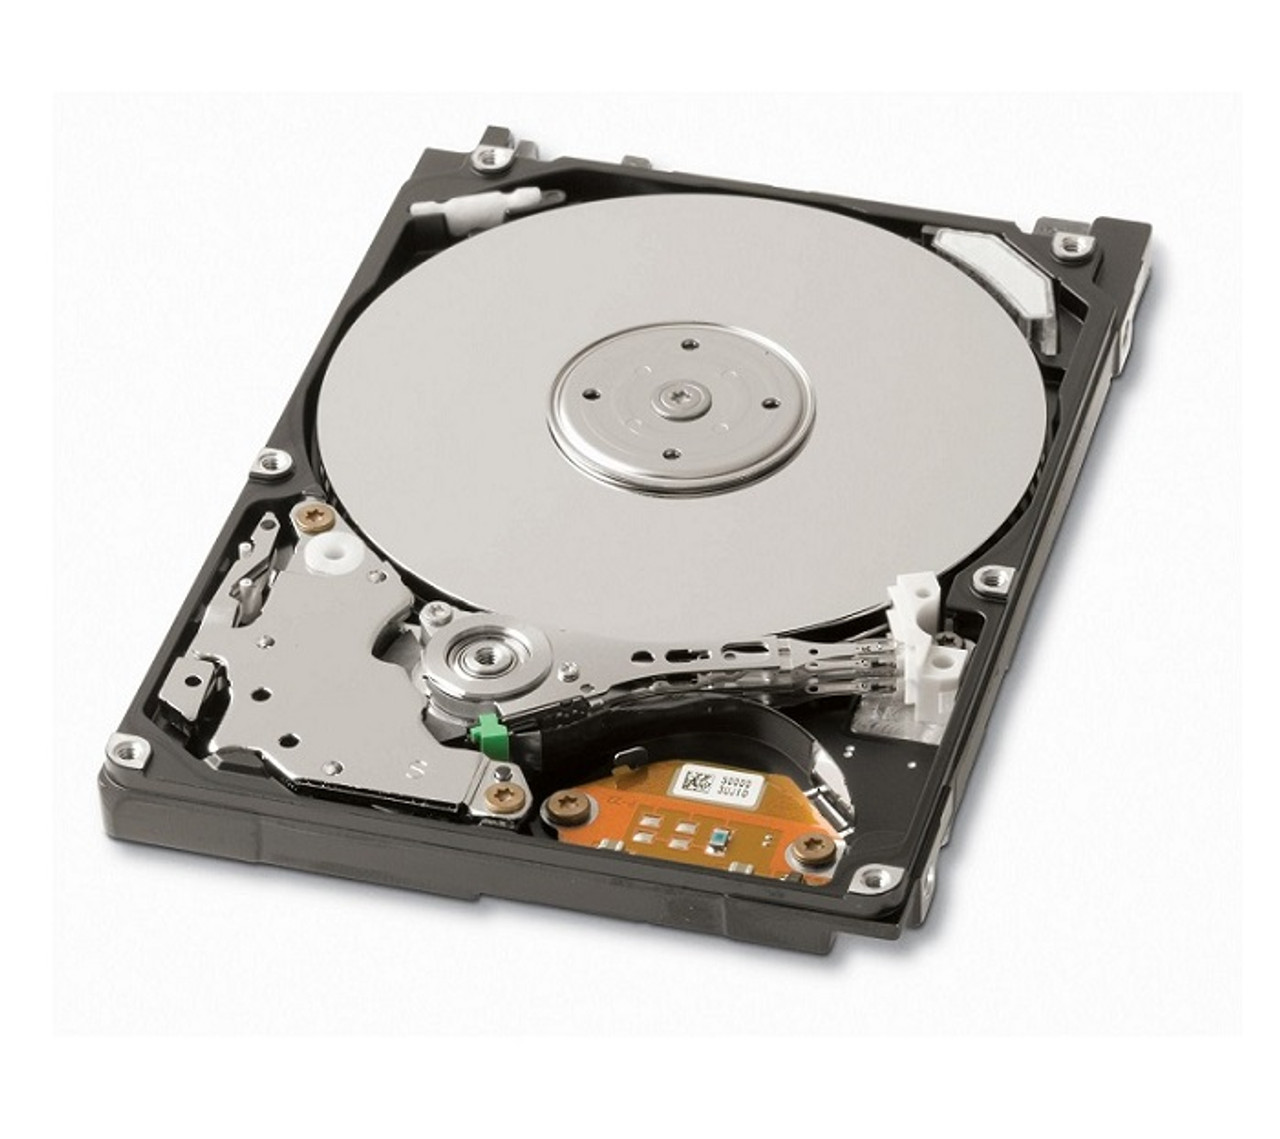 0J38072 - Hitachi Travelstar Z7K500 250GB 7200RPM SATA 6GB/s 32MB Cache 2.5-inch Hard Disk Drive